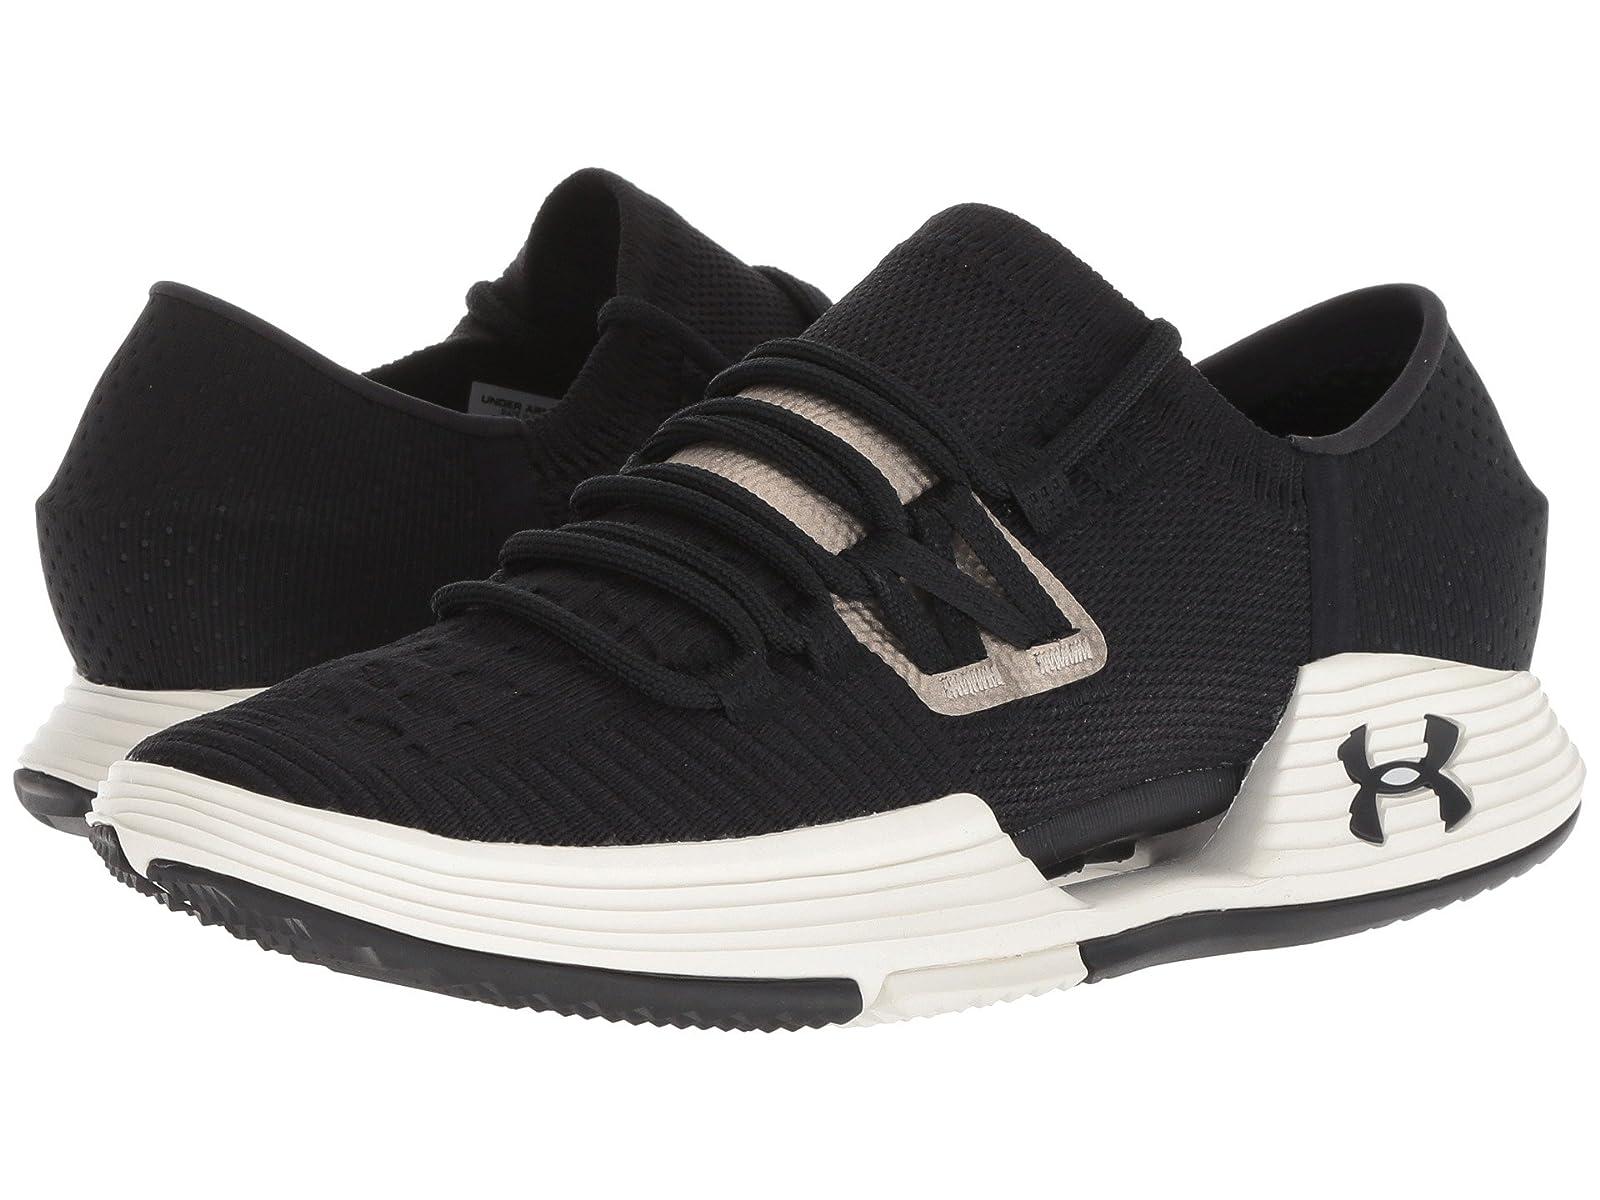 Under Armour UA Speedform AMP 3.0Atmospheric grades have affordable shoes